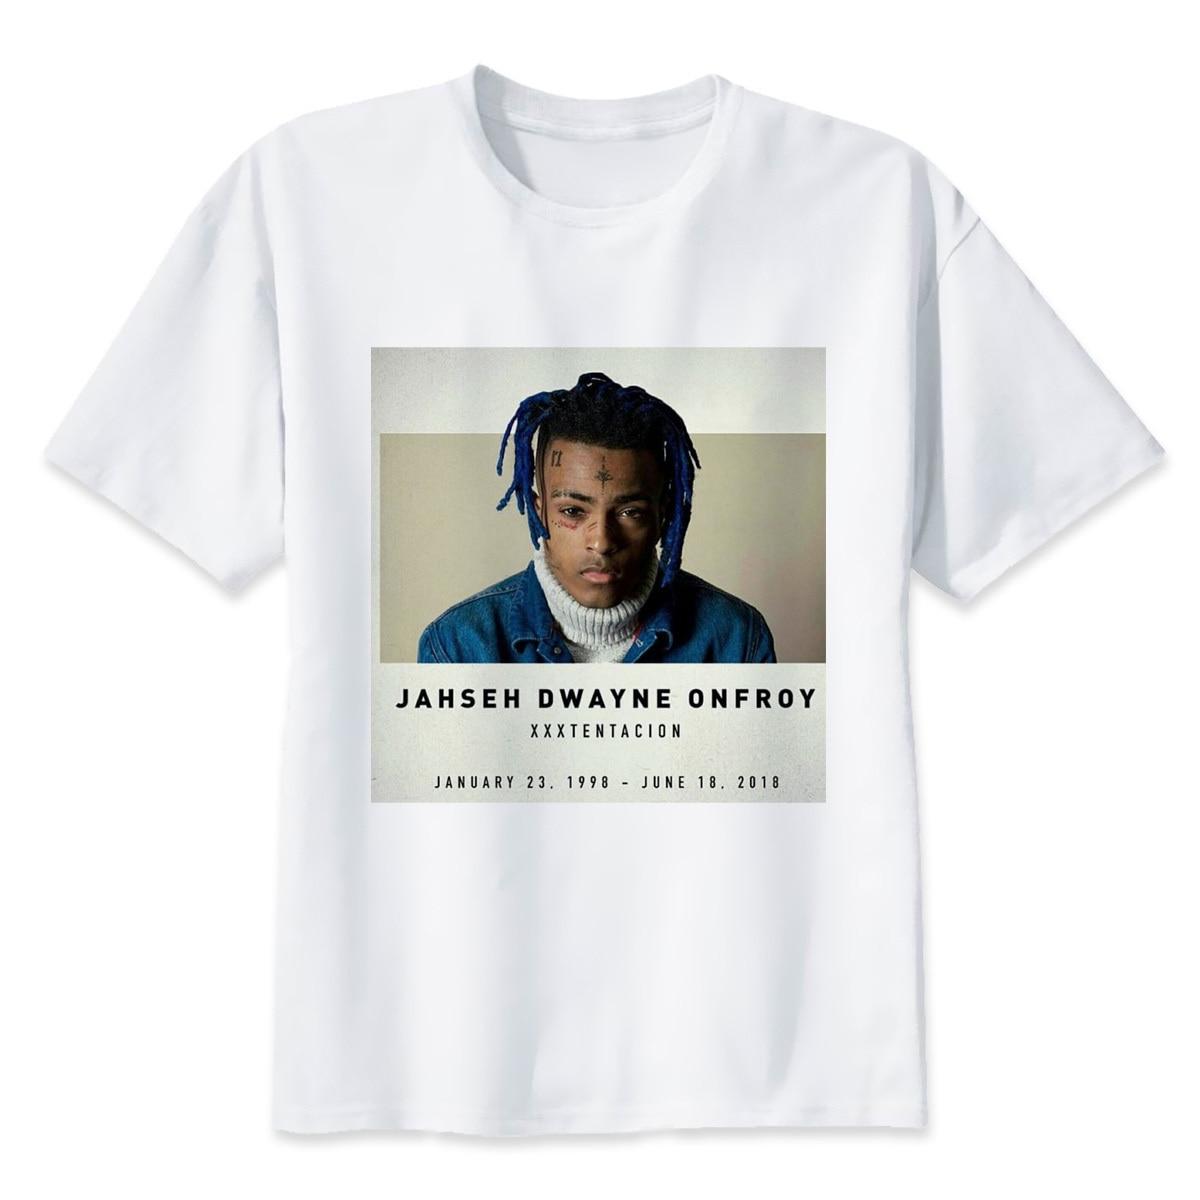 T Shirts Men Character Printed Men's T Shirt O-Neck  T-Shirt For Male Xxxtentacion JAHSEH DWAYNE ONFROY